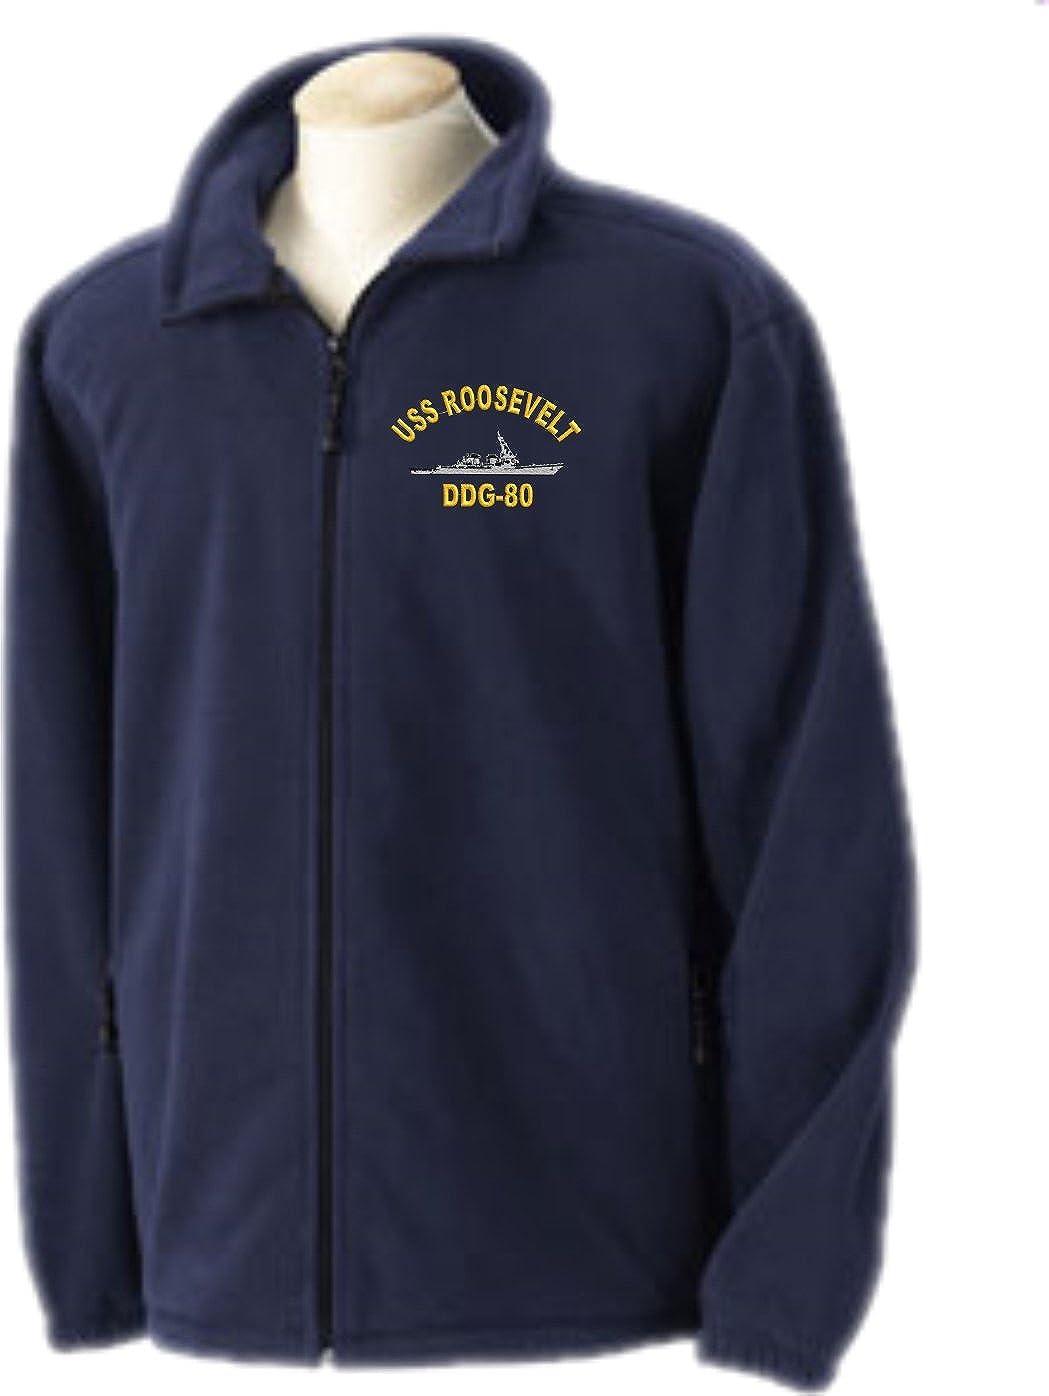 CMA USS Roosevelt DDG-80 Embroidered Fleece Jacket Sizes SMALL-4X